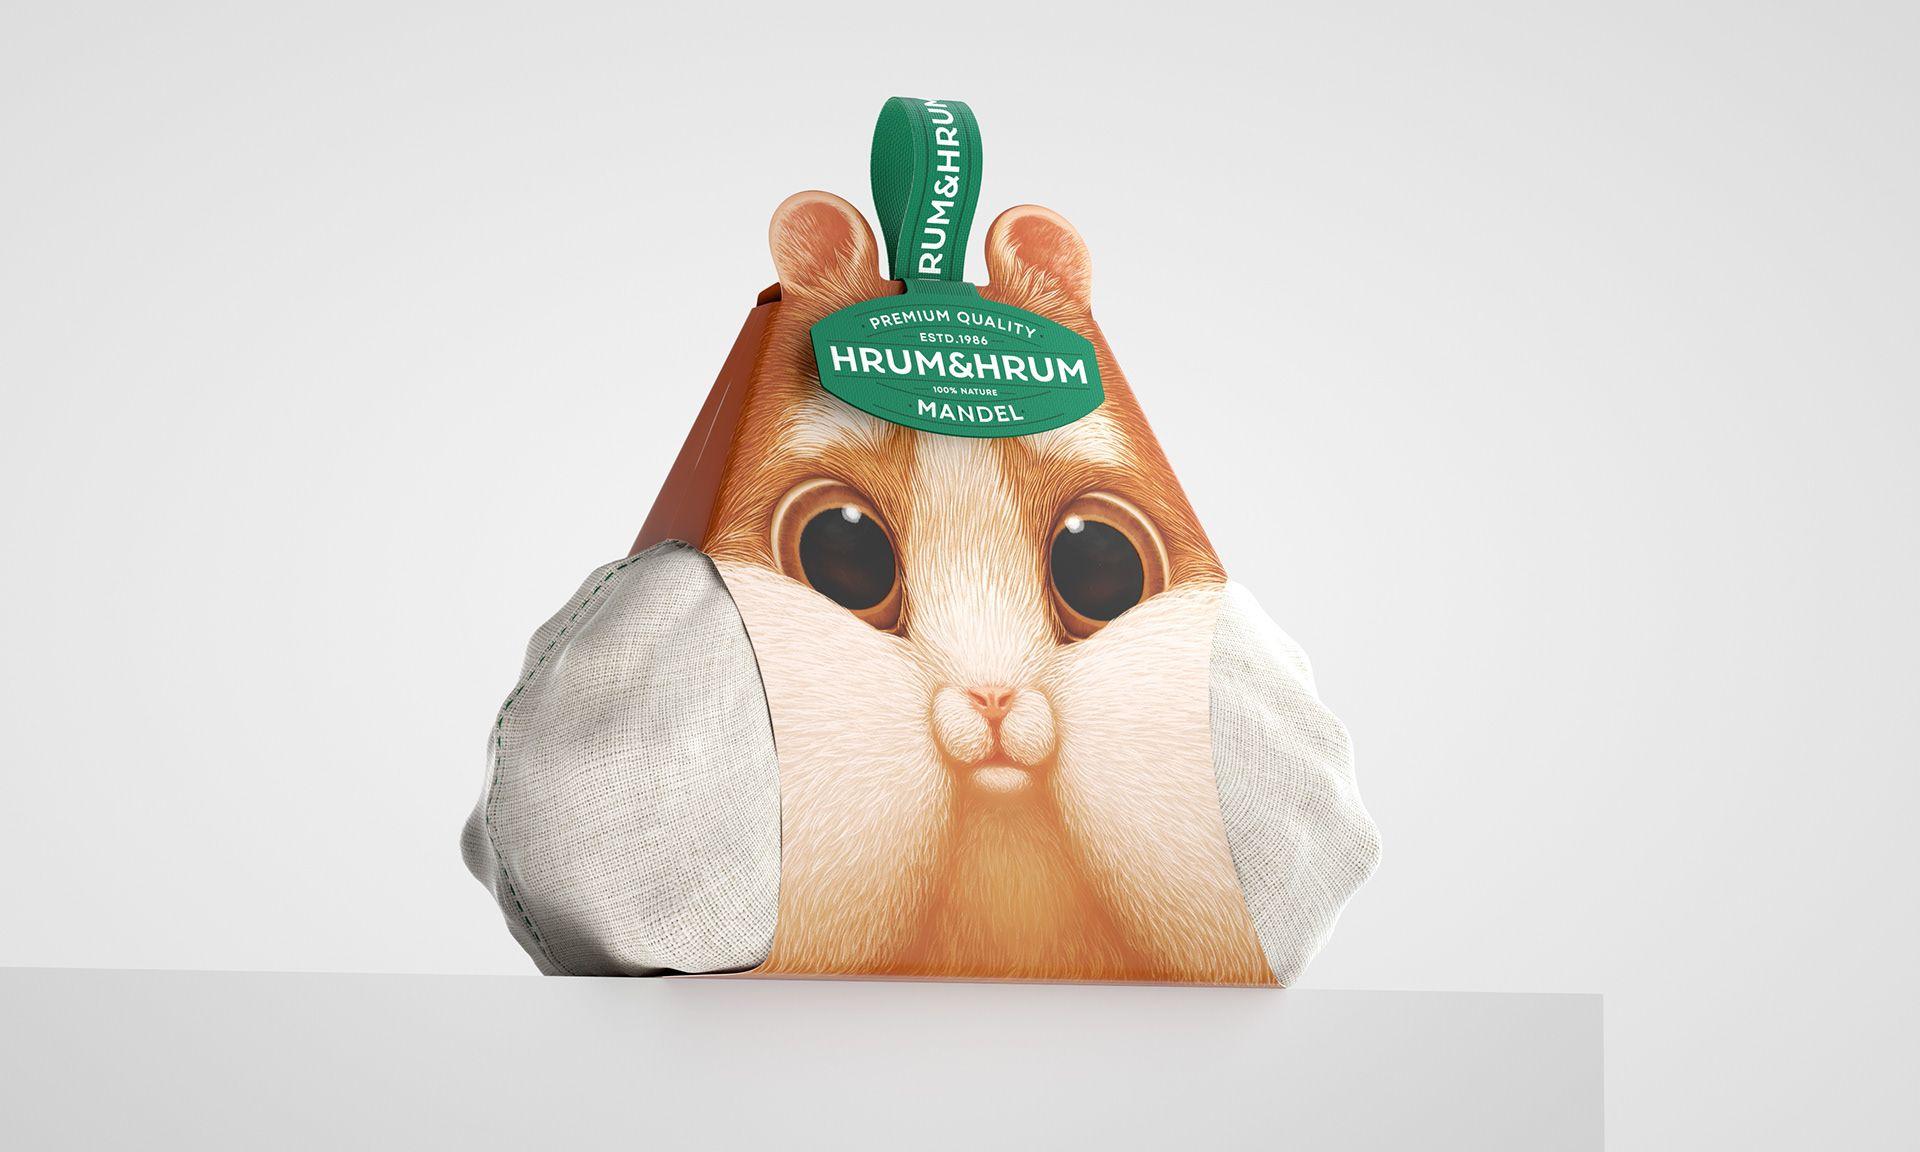 Hrum-Hrum on Behance in 2020 | Common food allergies, Health benefits of almonds, Almond benefits